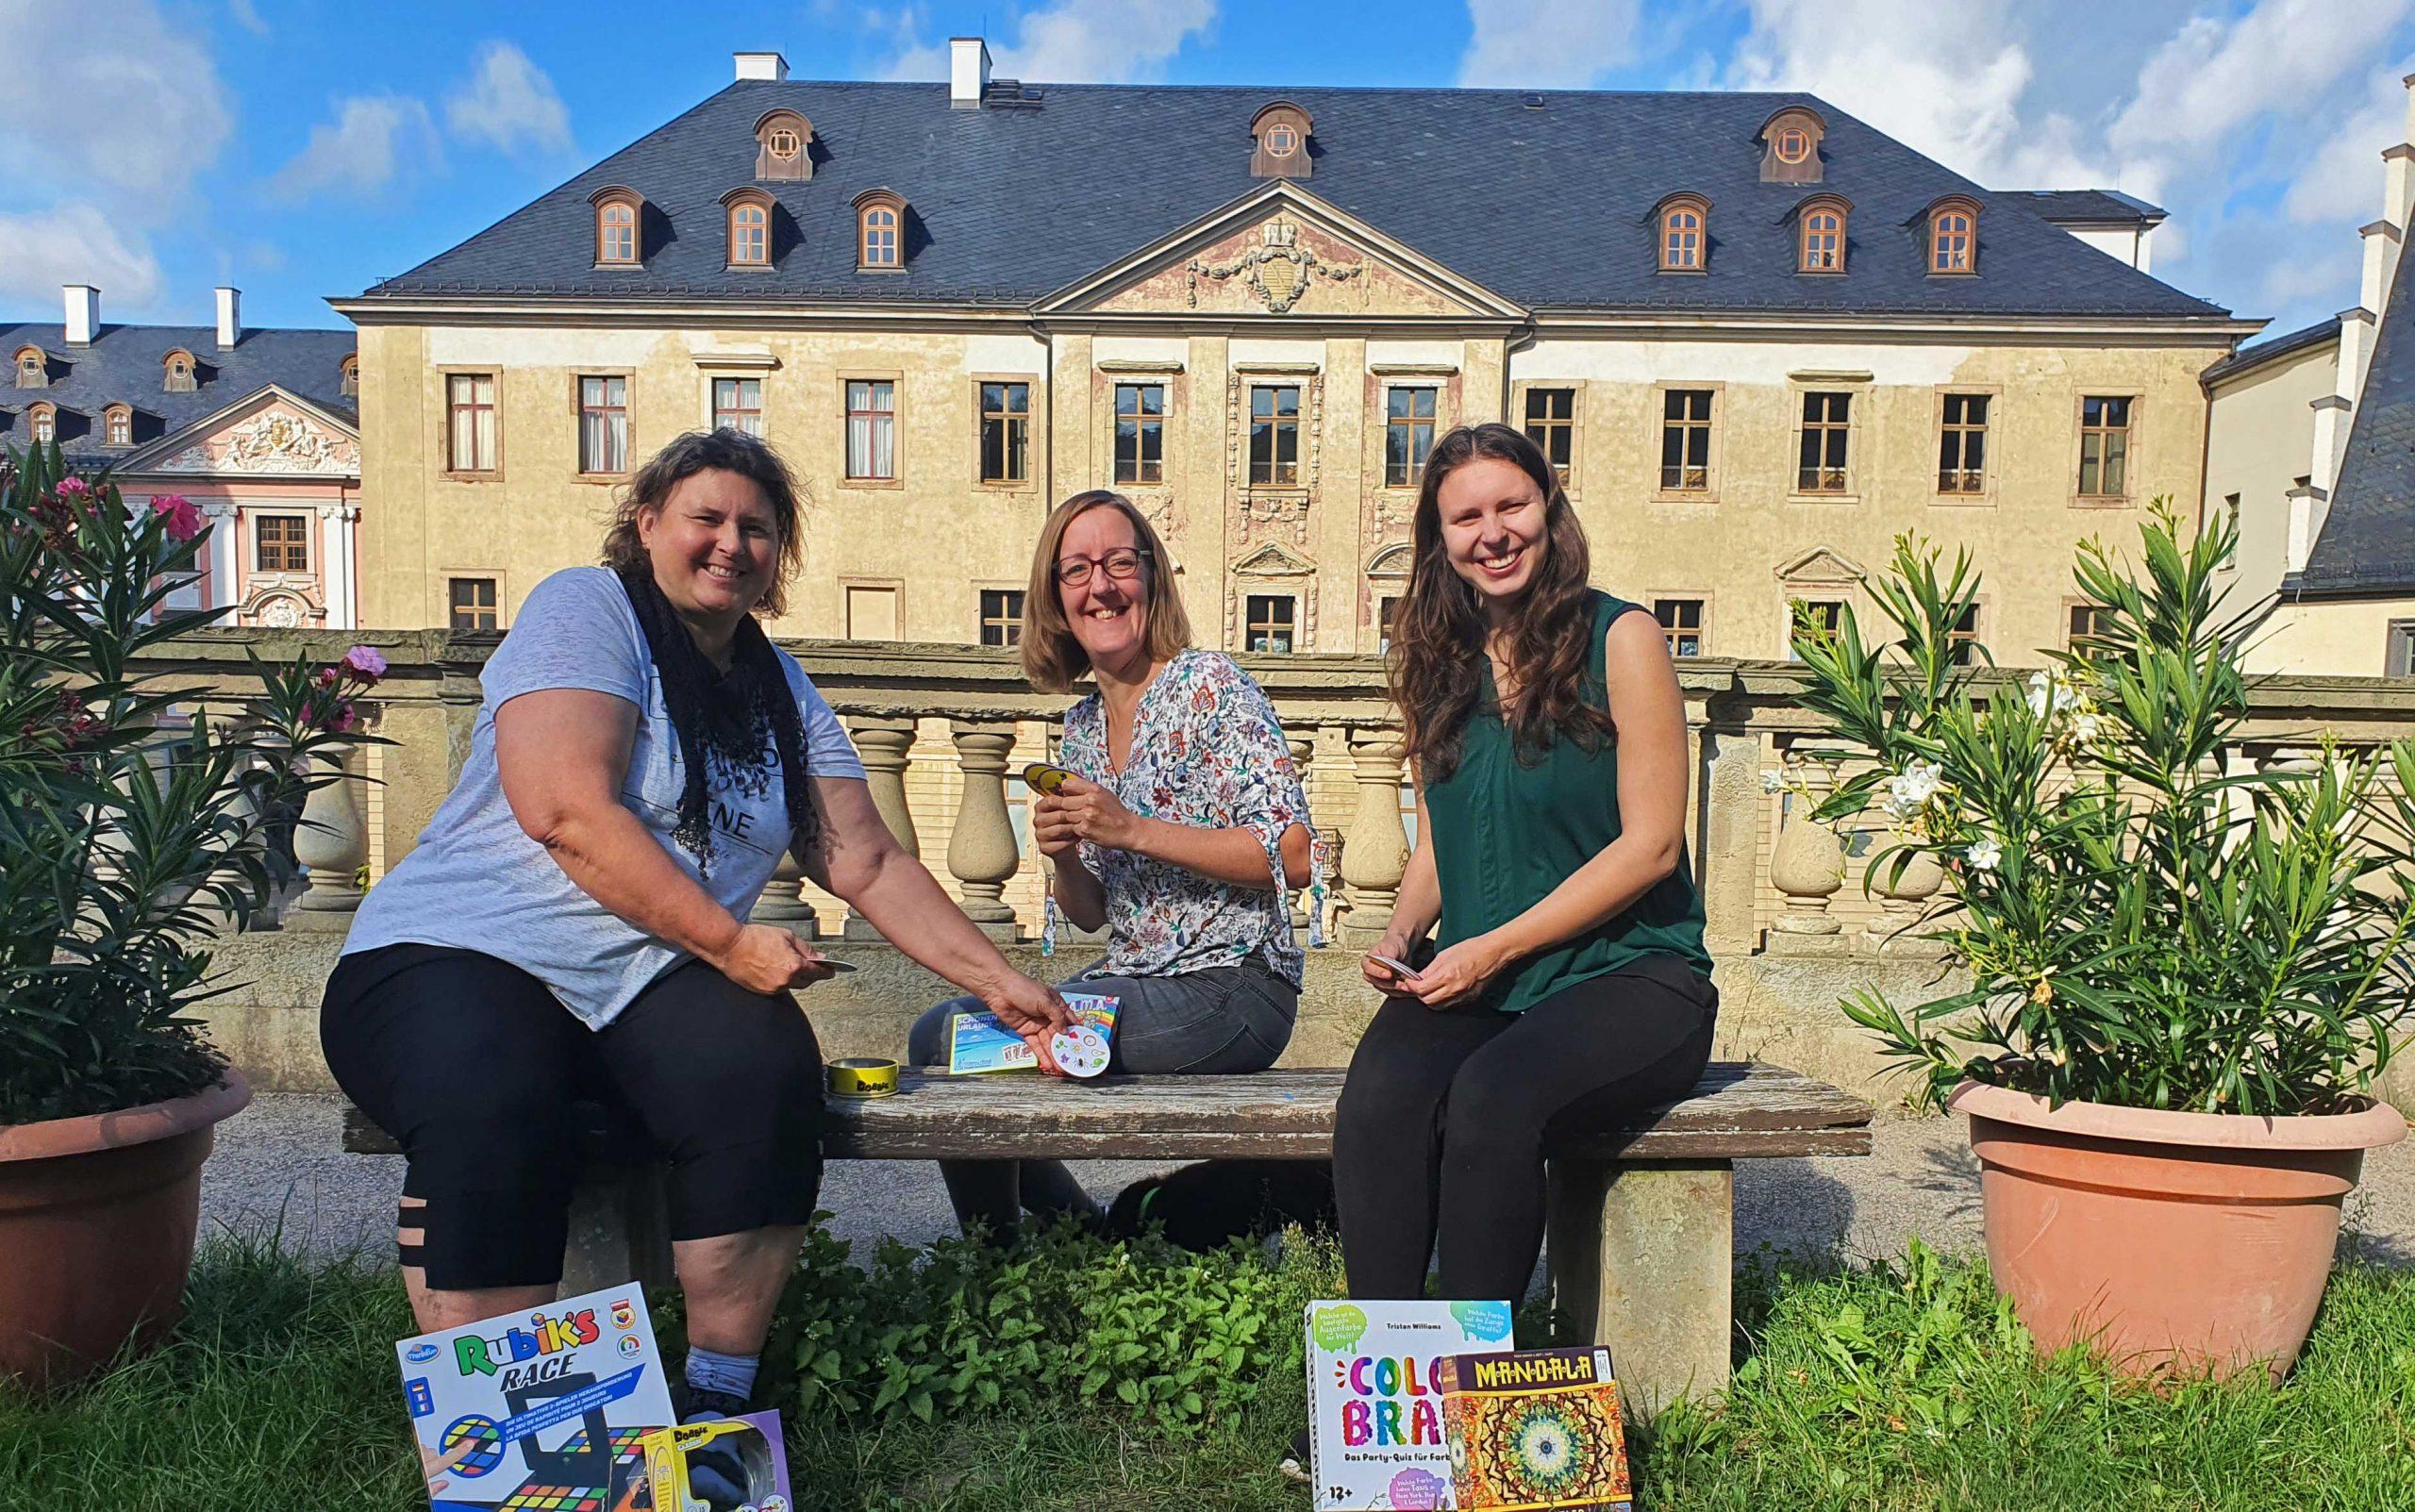 Gabi, Maike und Sarah-Ann im Agnesgarten, Foto: Andre